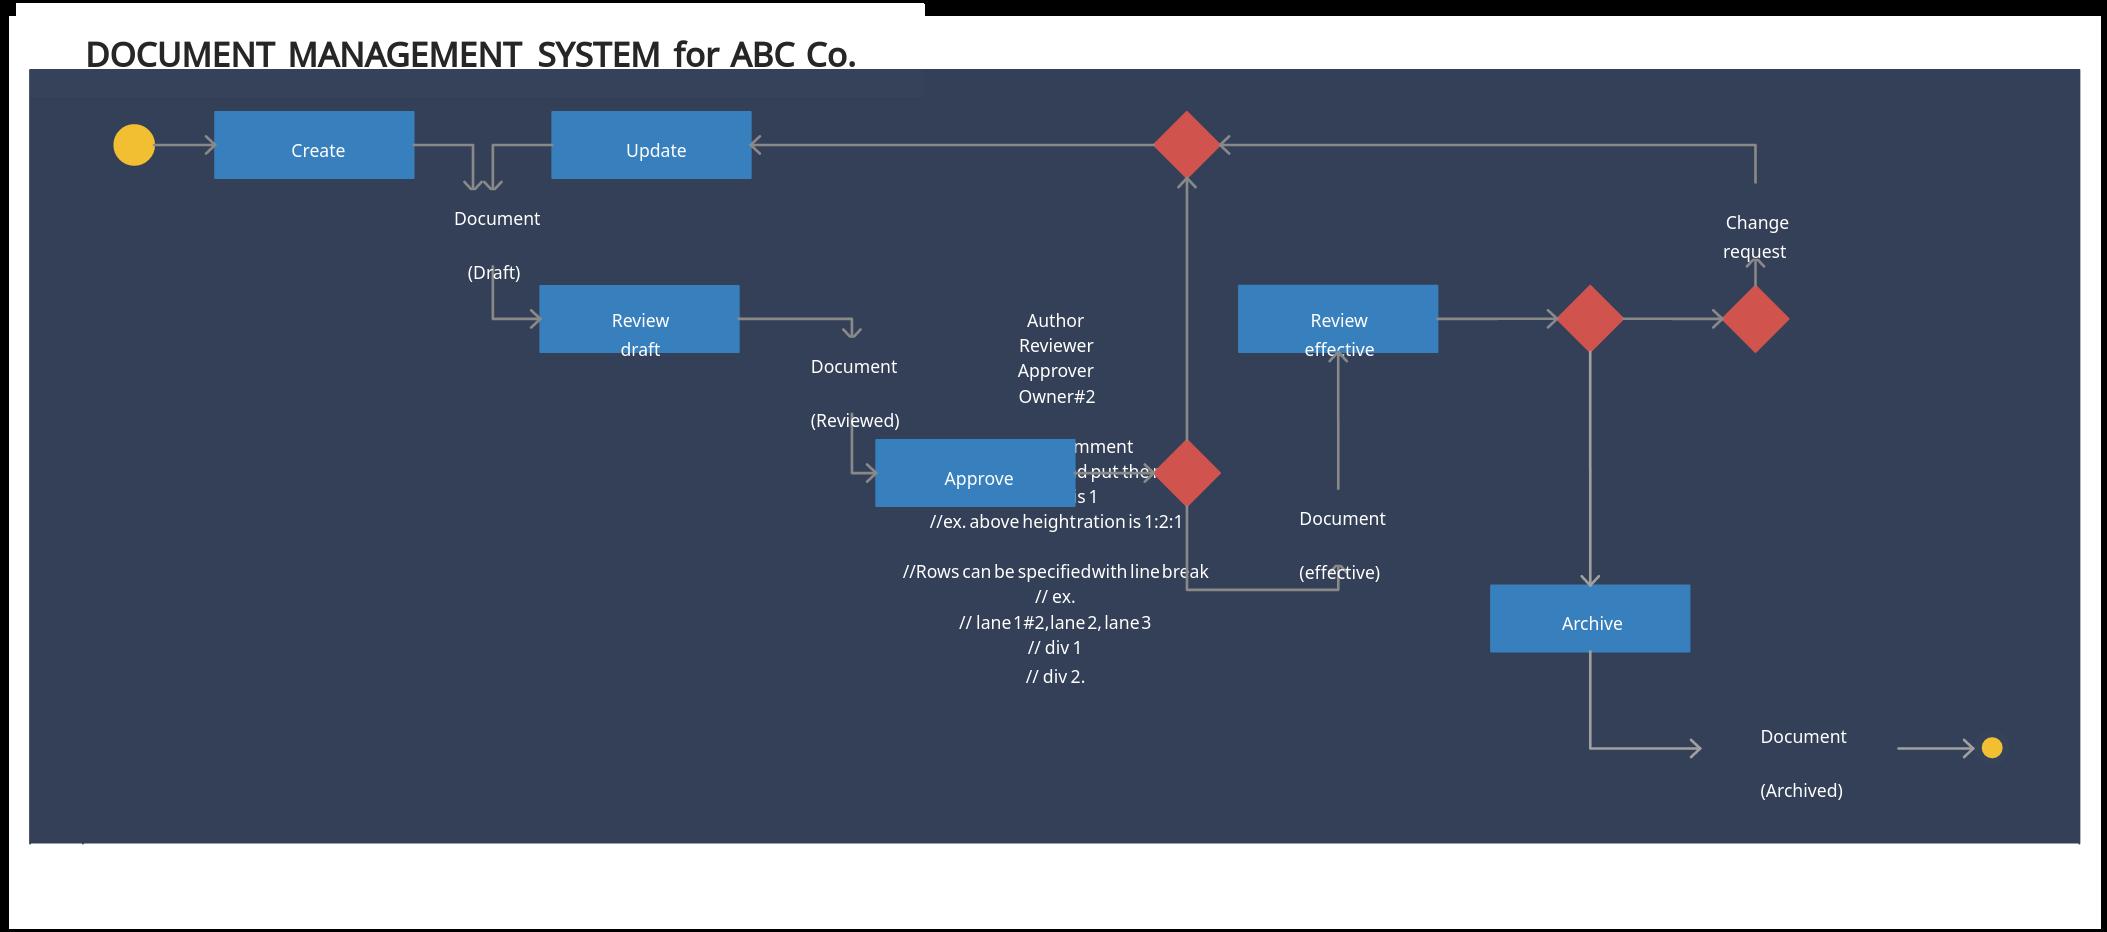 Activity Diagram for Document Management System